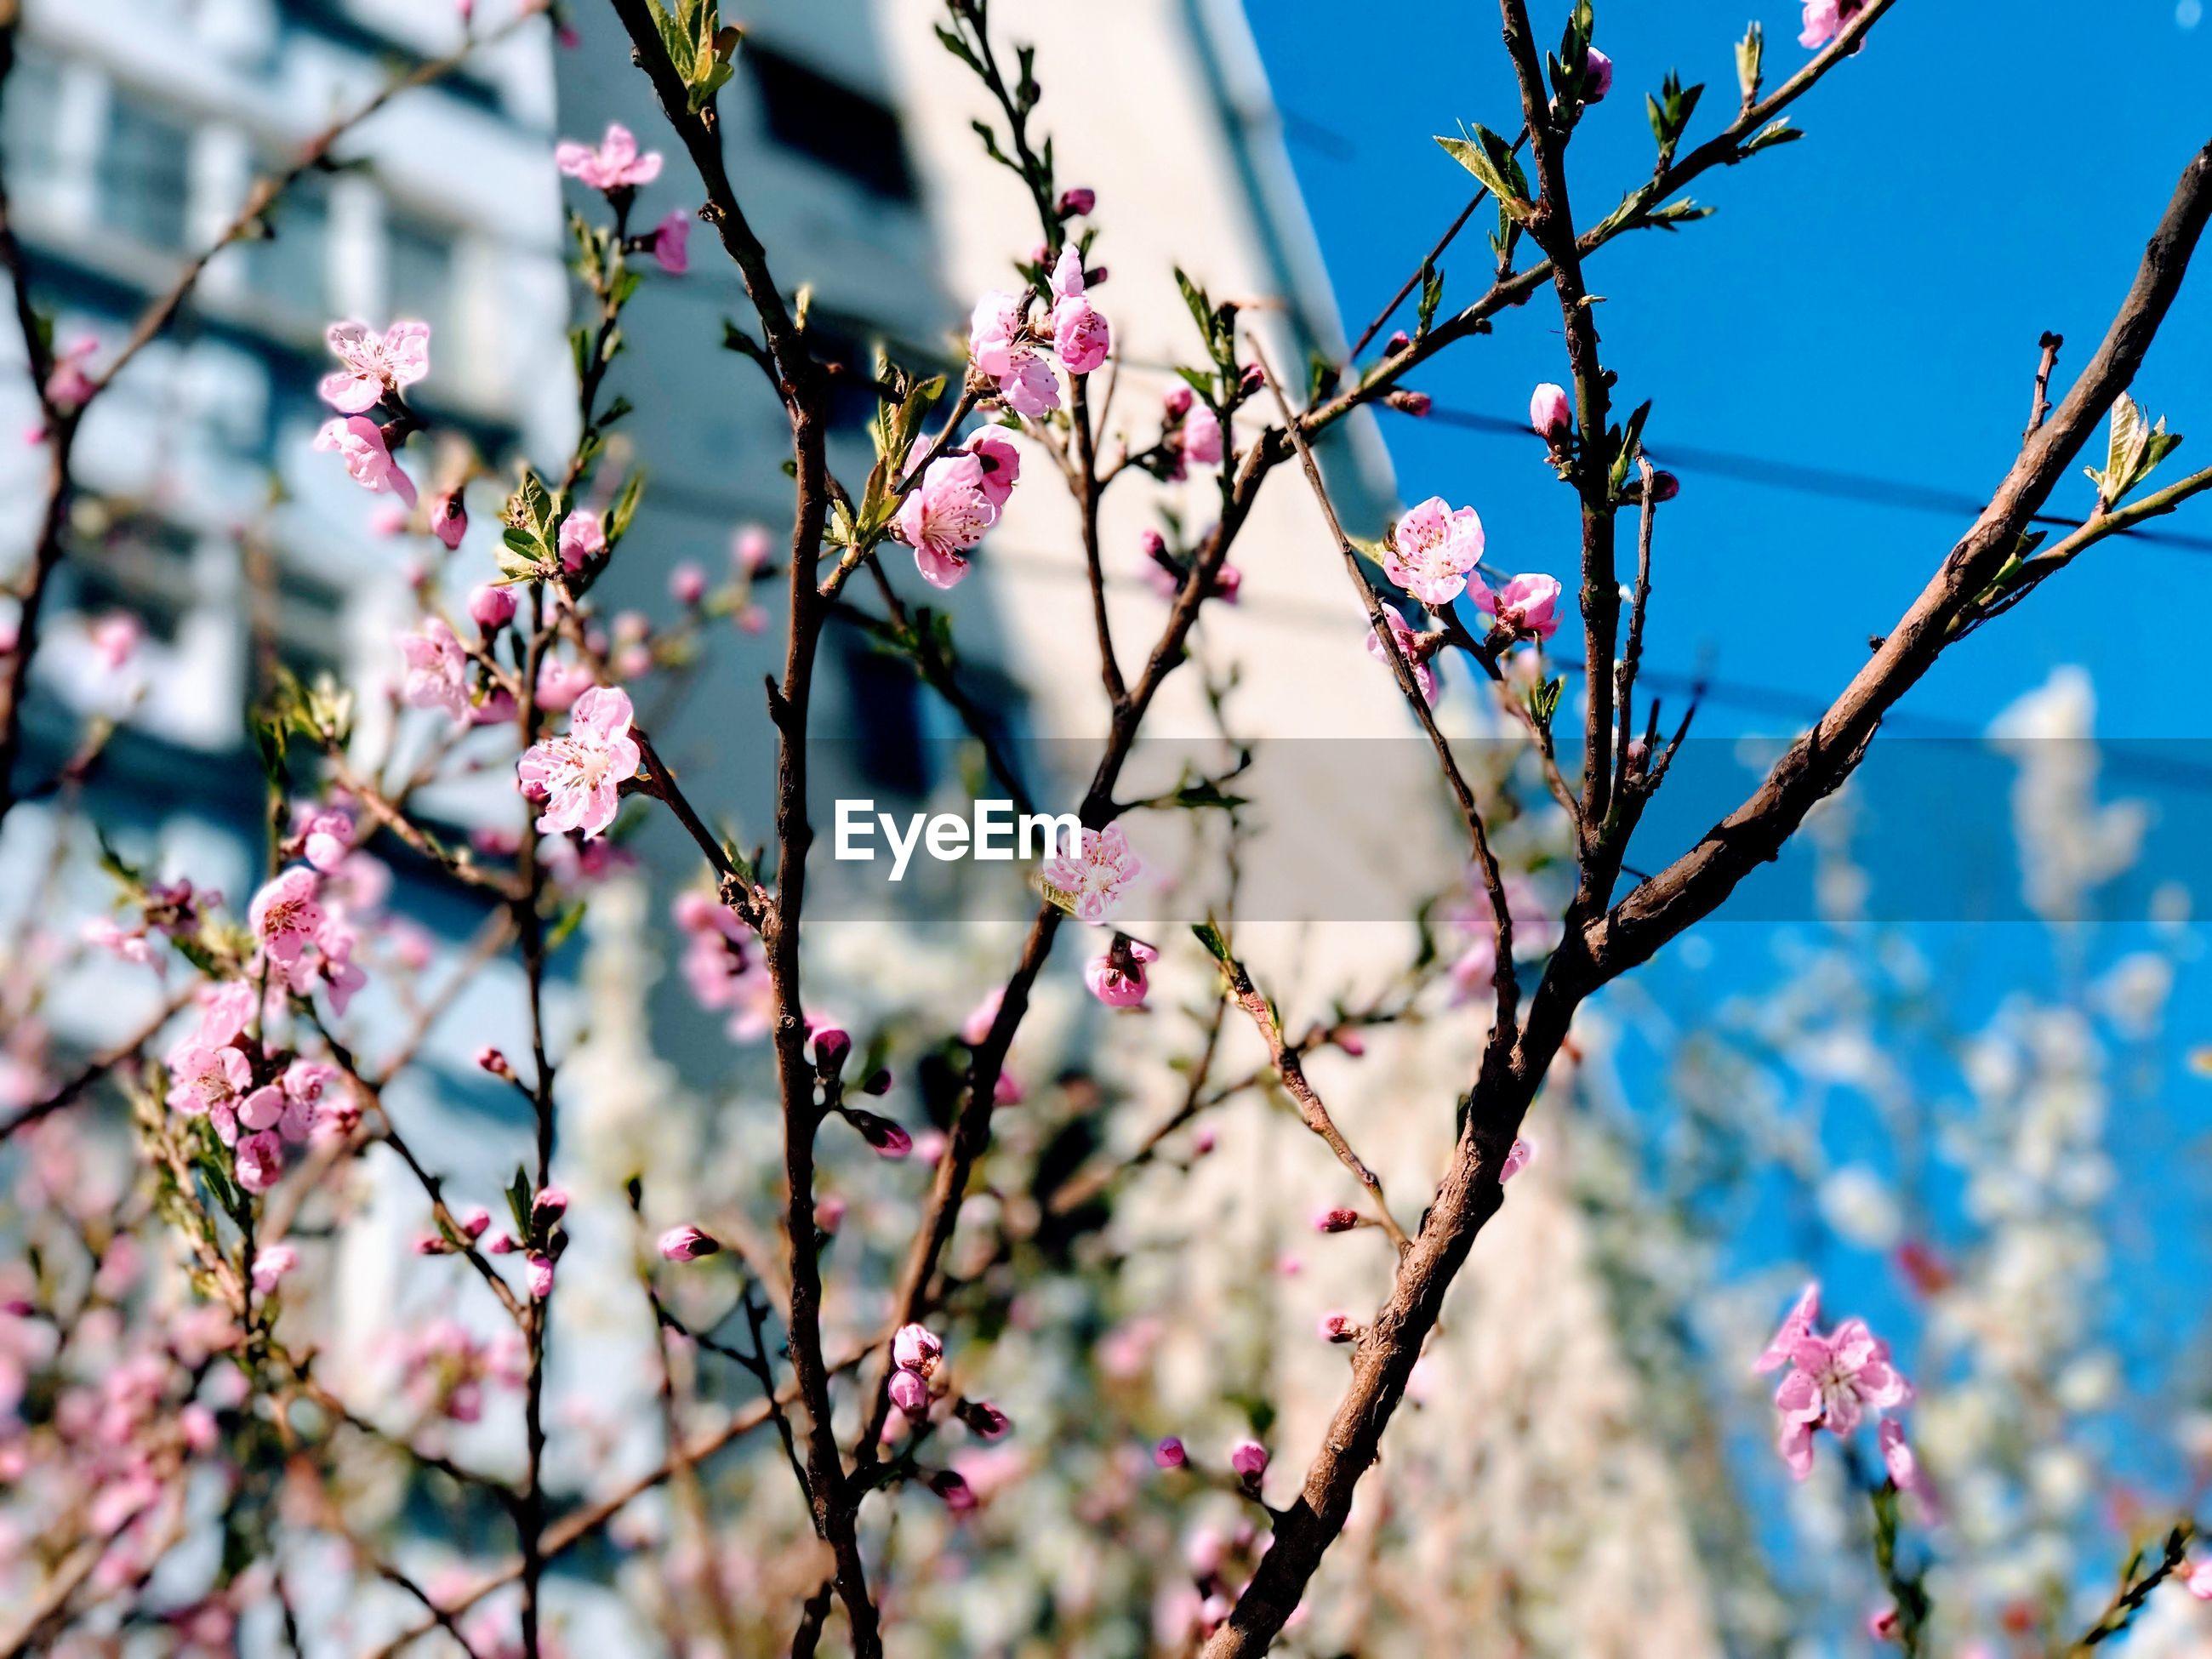 CLOSE UP OF FLOWER TREE